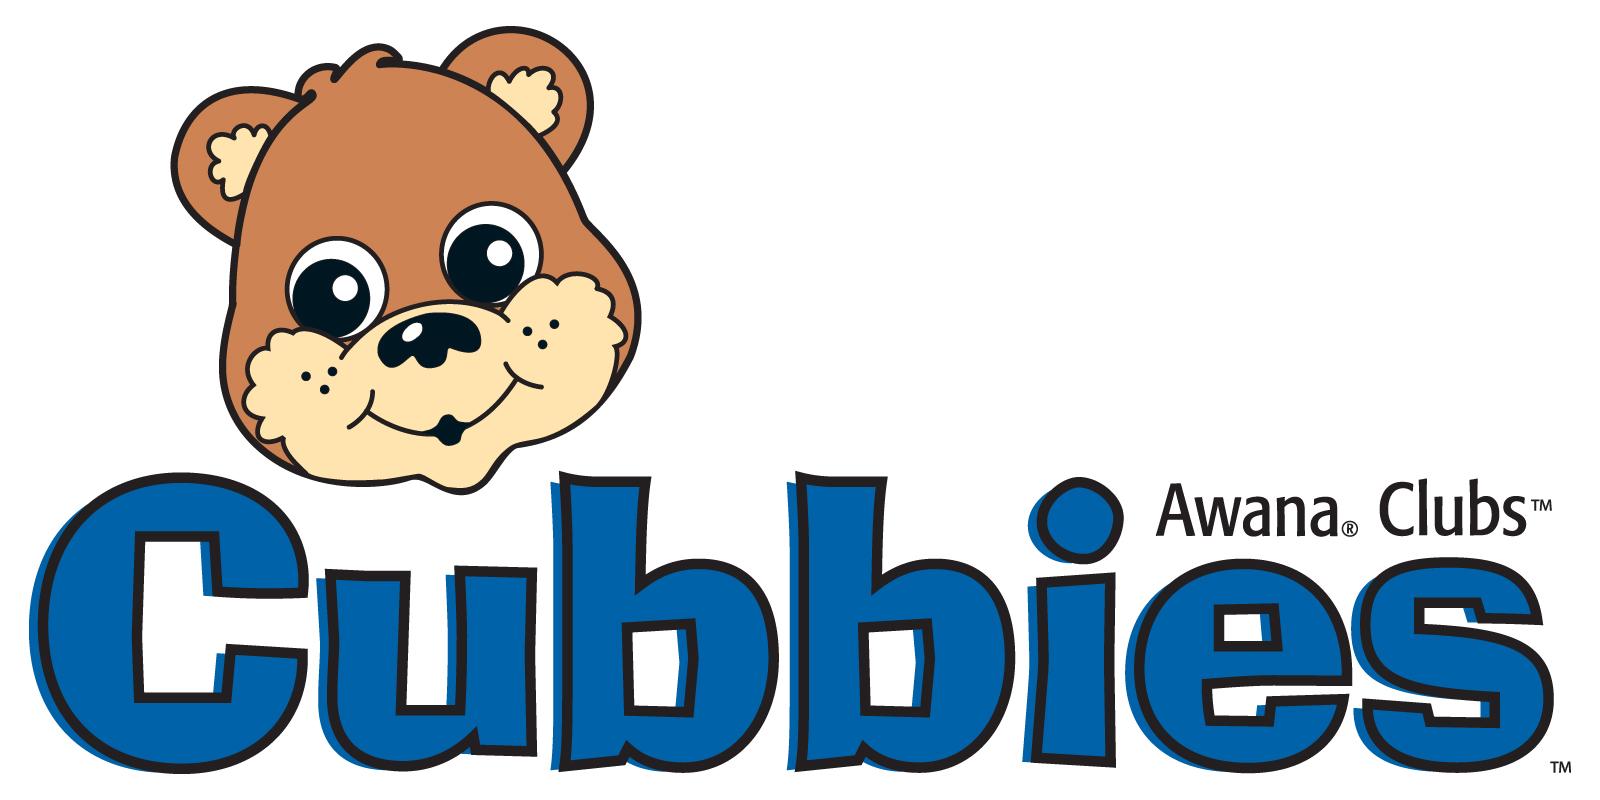 Clubs cubbies logo. Awana clipart flag